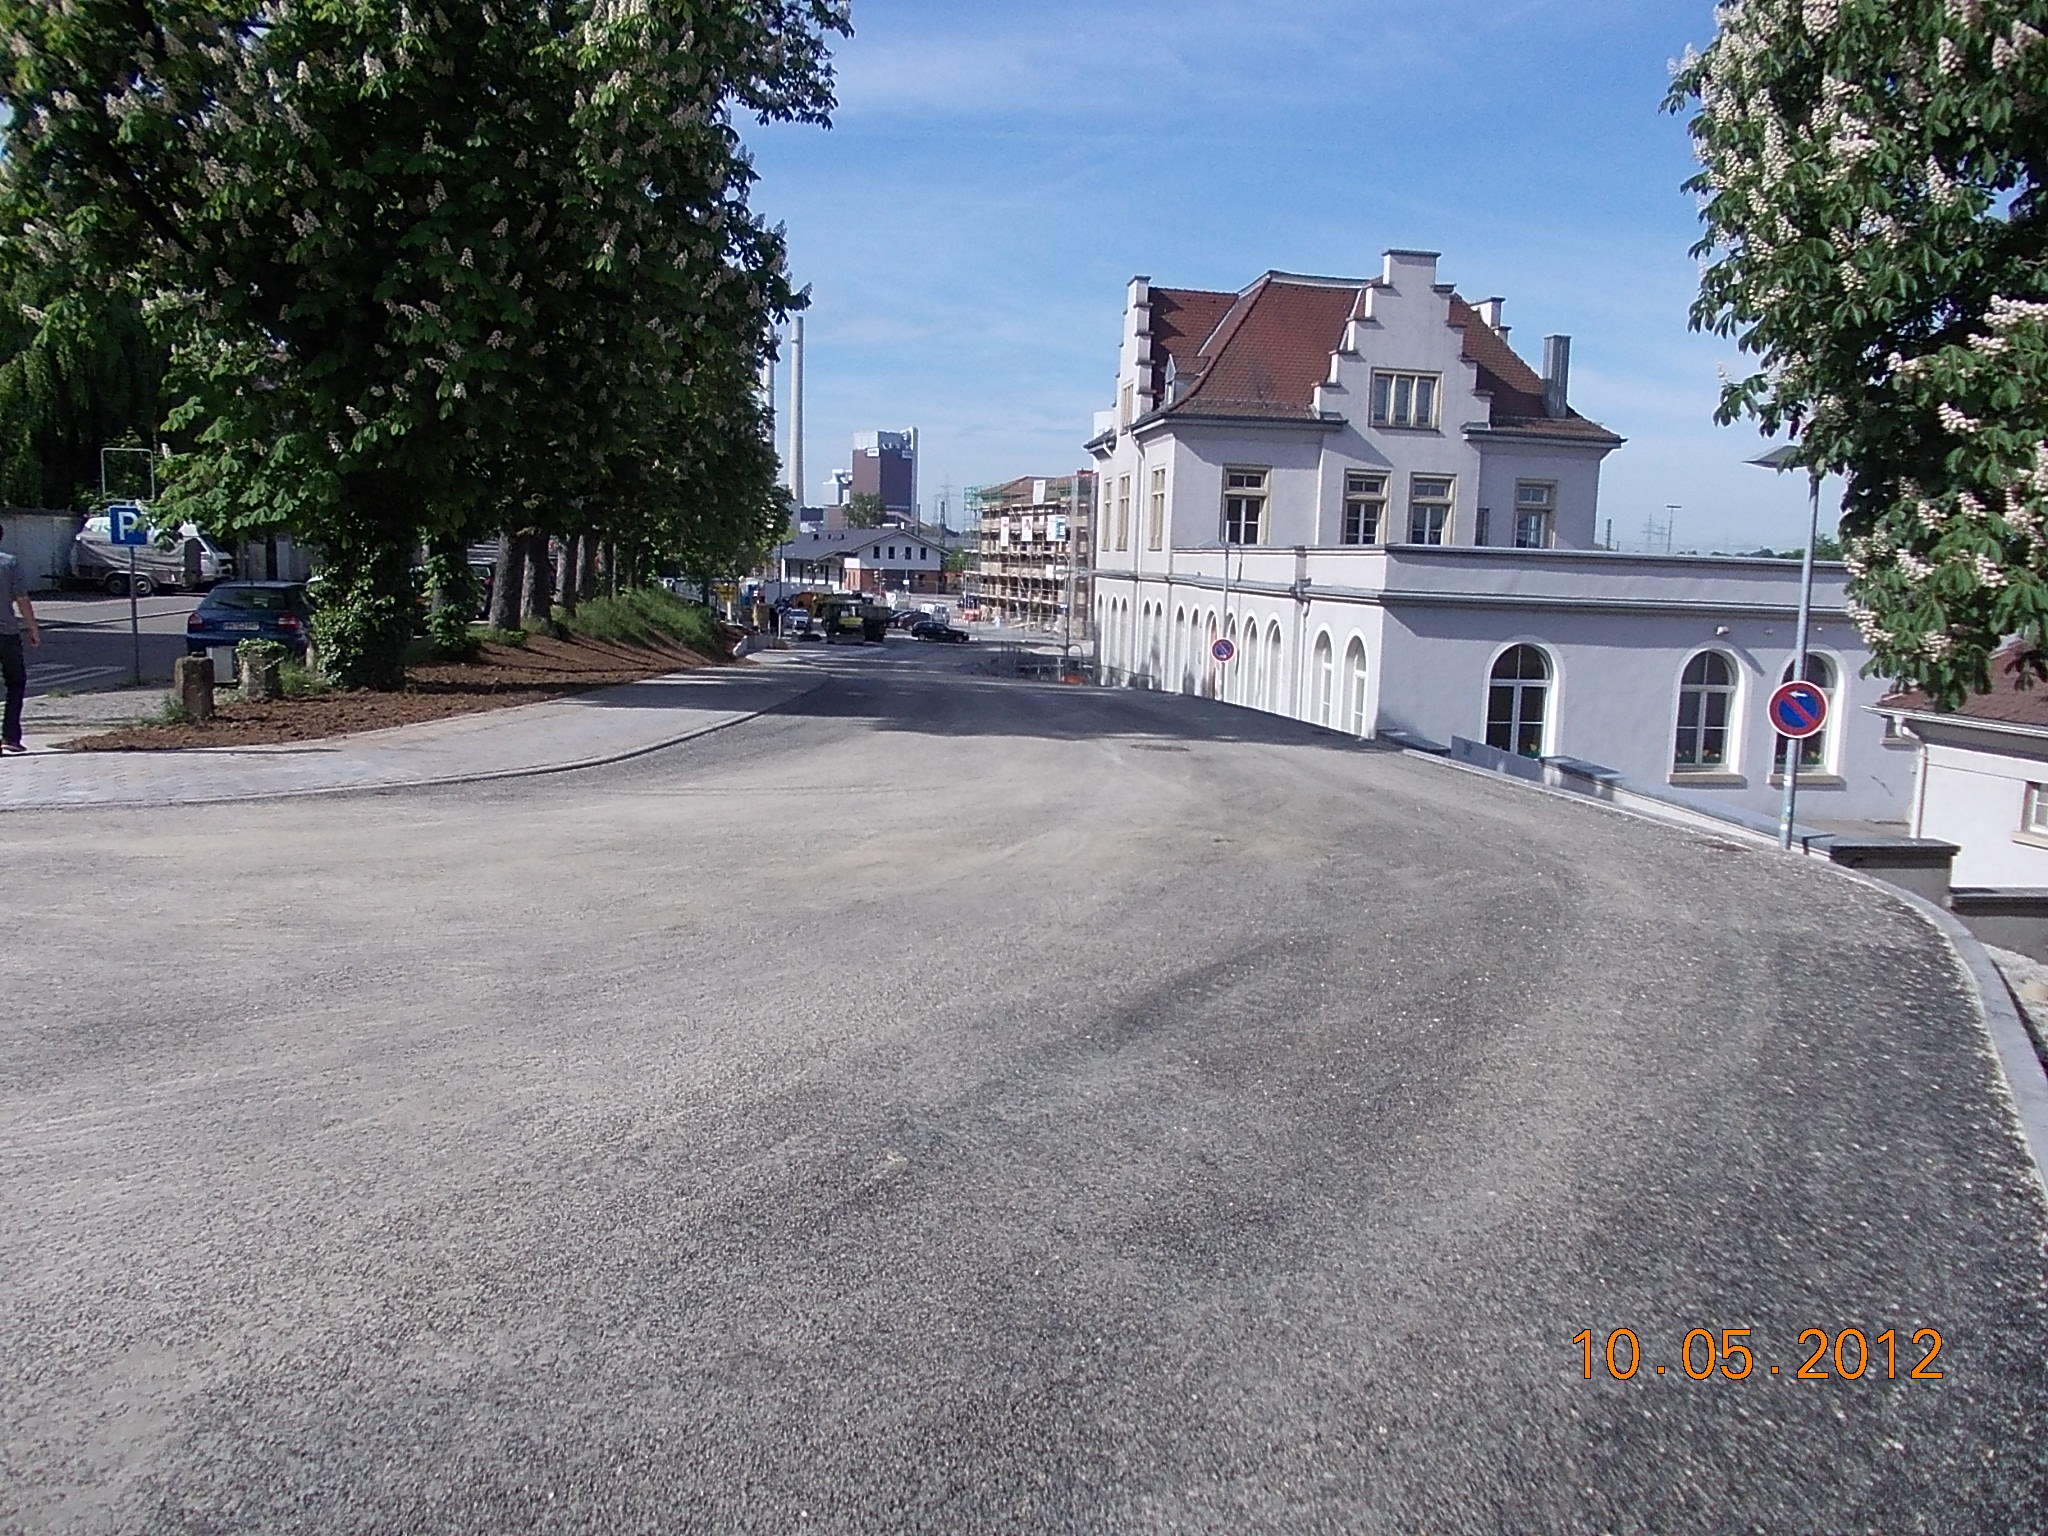 Bahnhofsareal-Ost_Neckarsulm_4